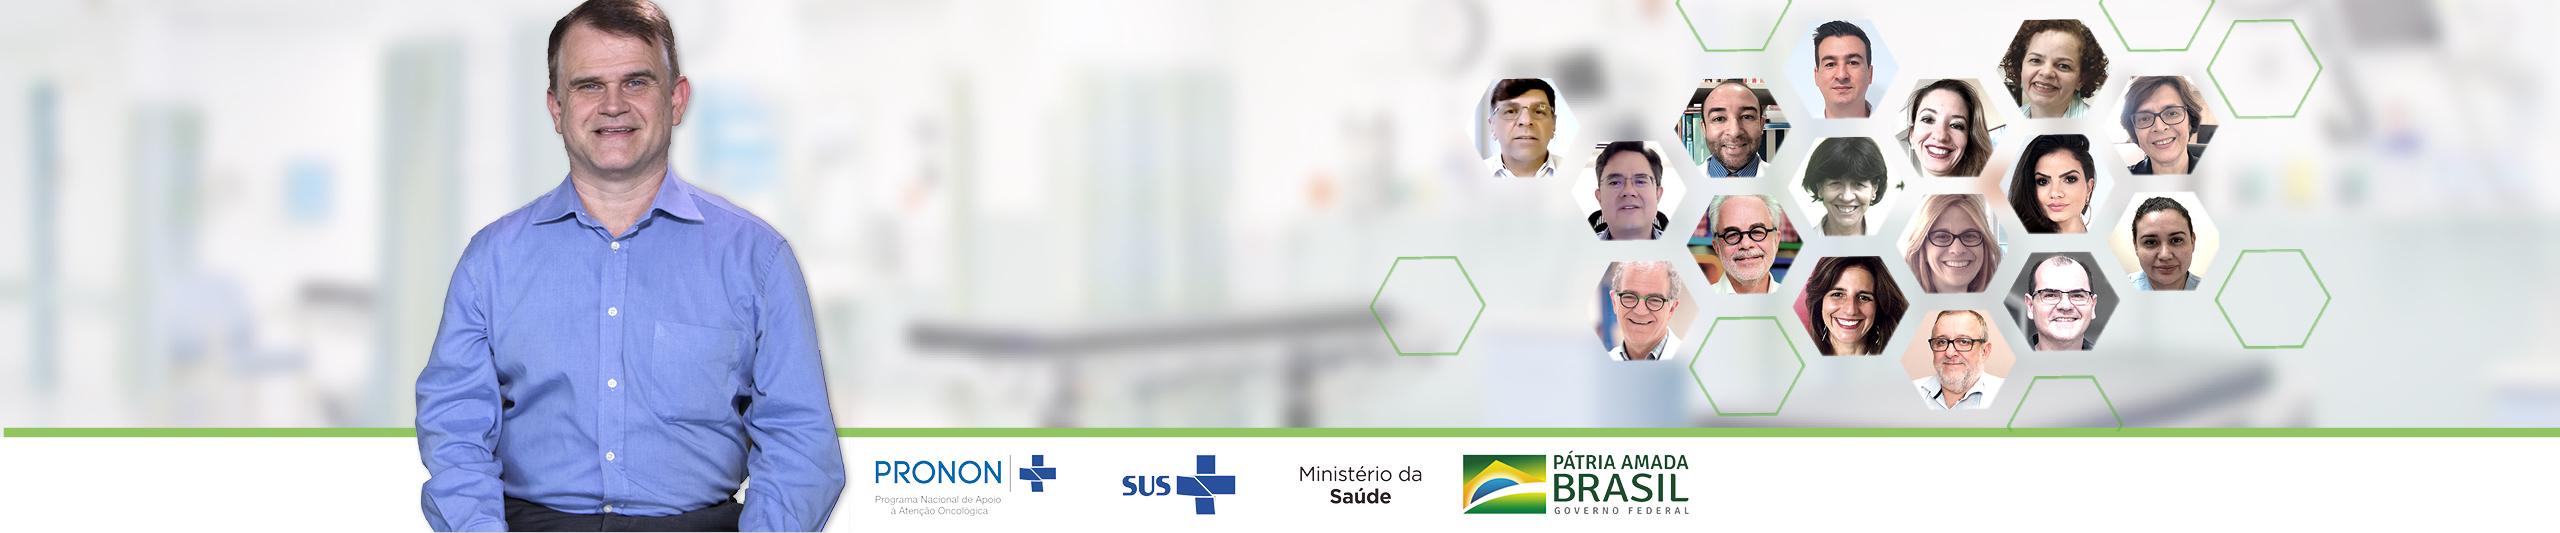 Banner terapias pediatricas